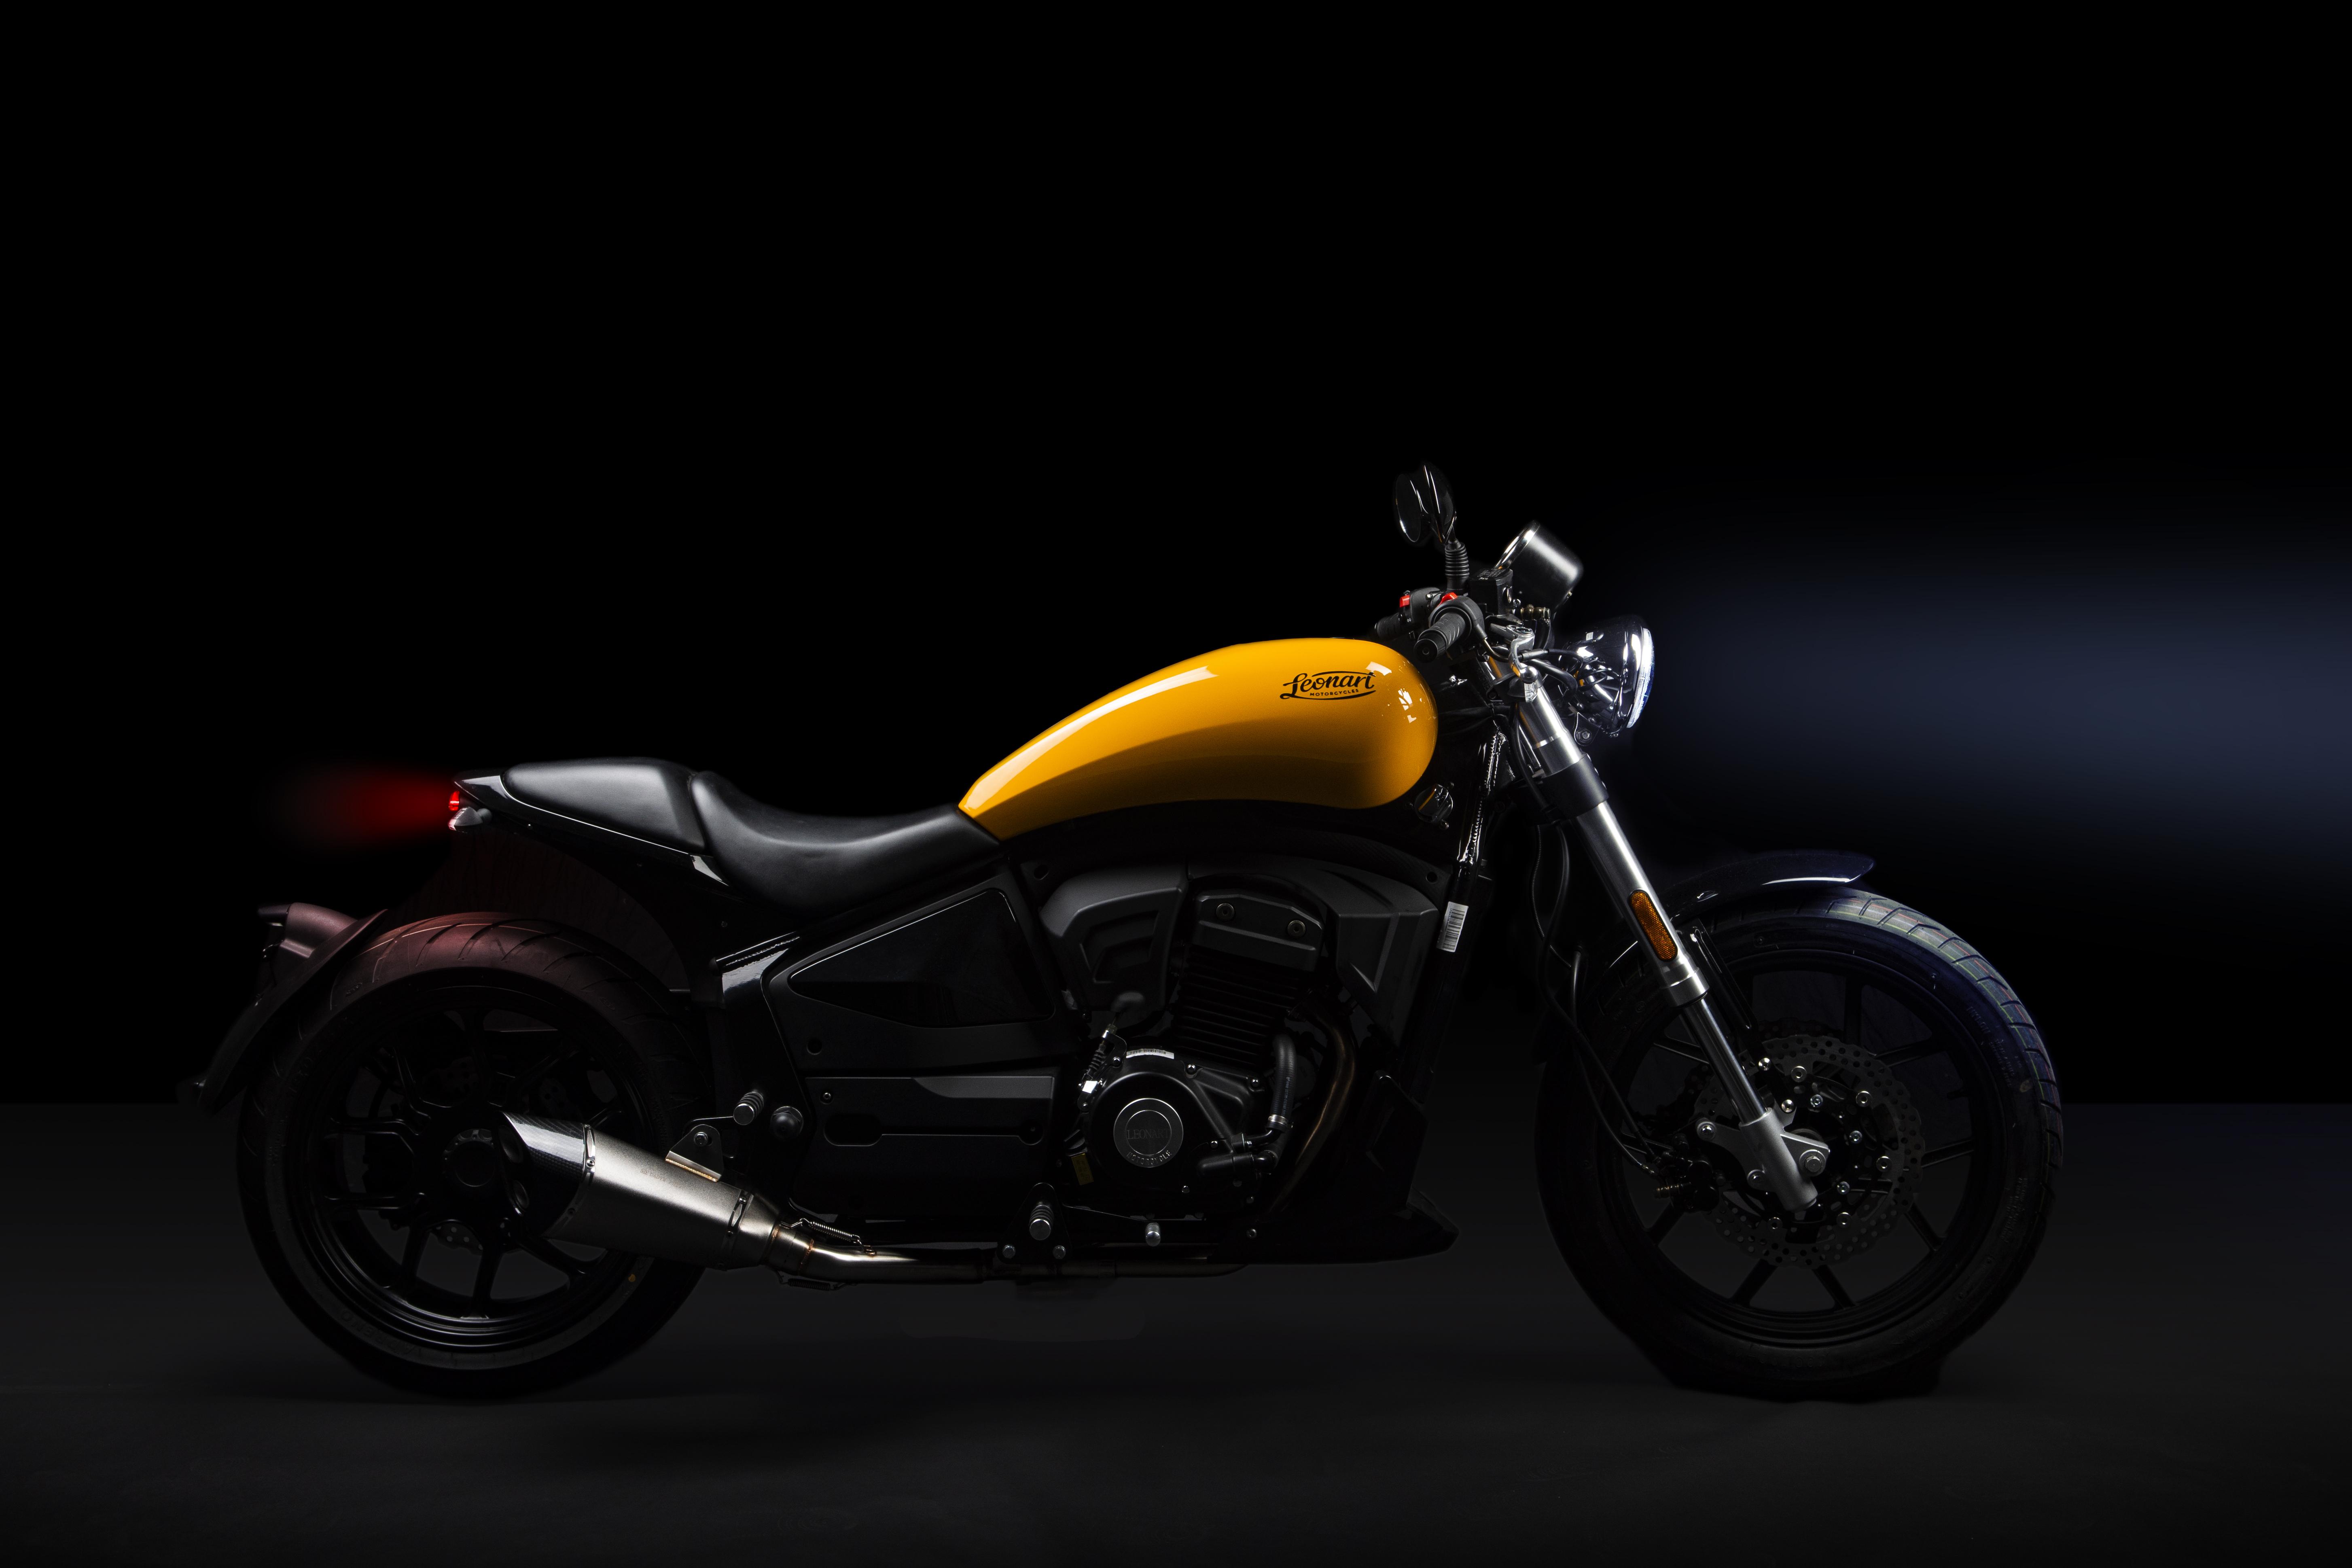 LEONART MOTORS - PILDER